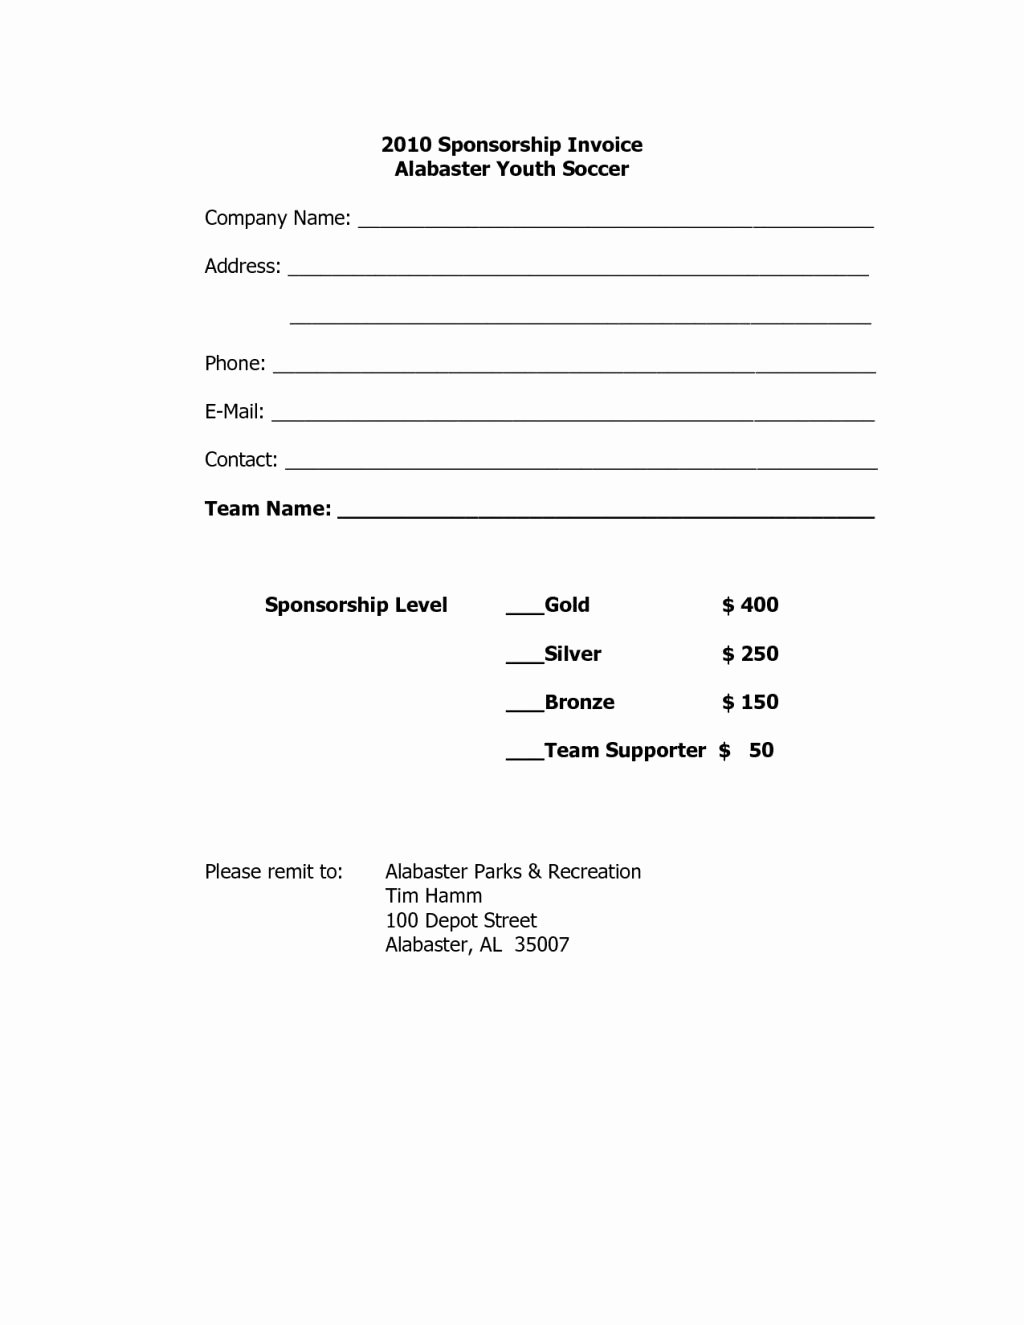 Sponsorship Invoice Template Word